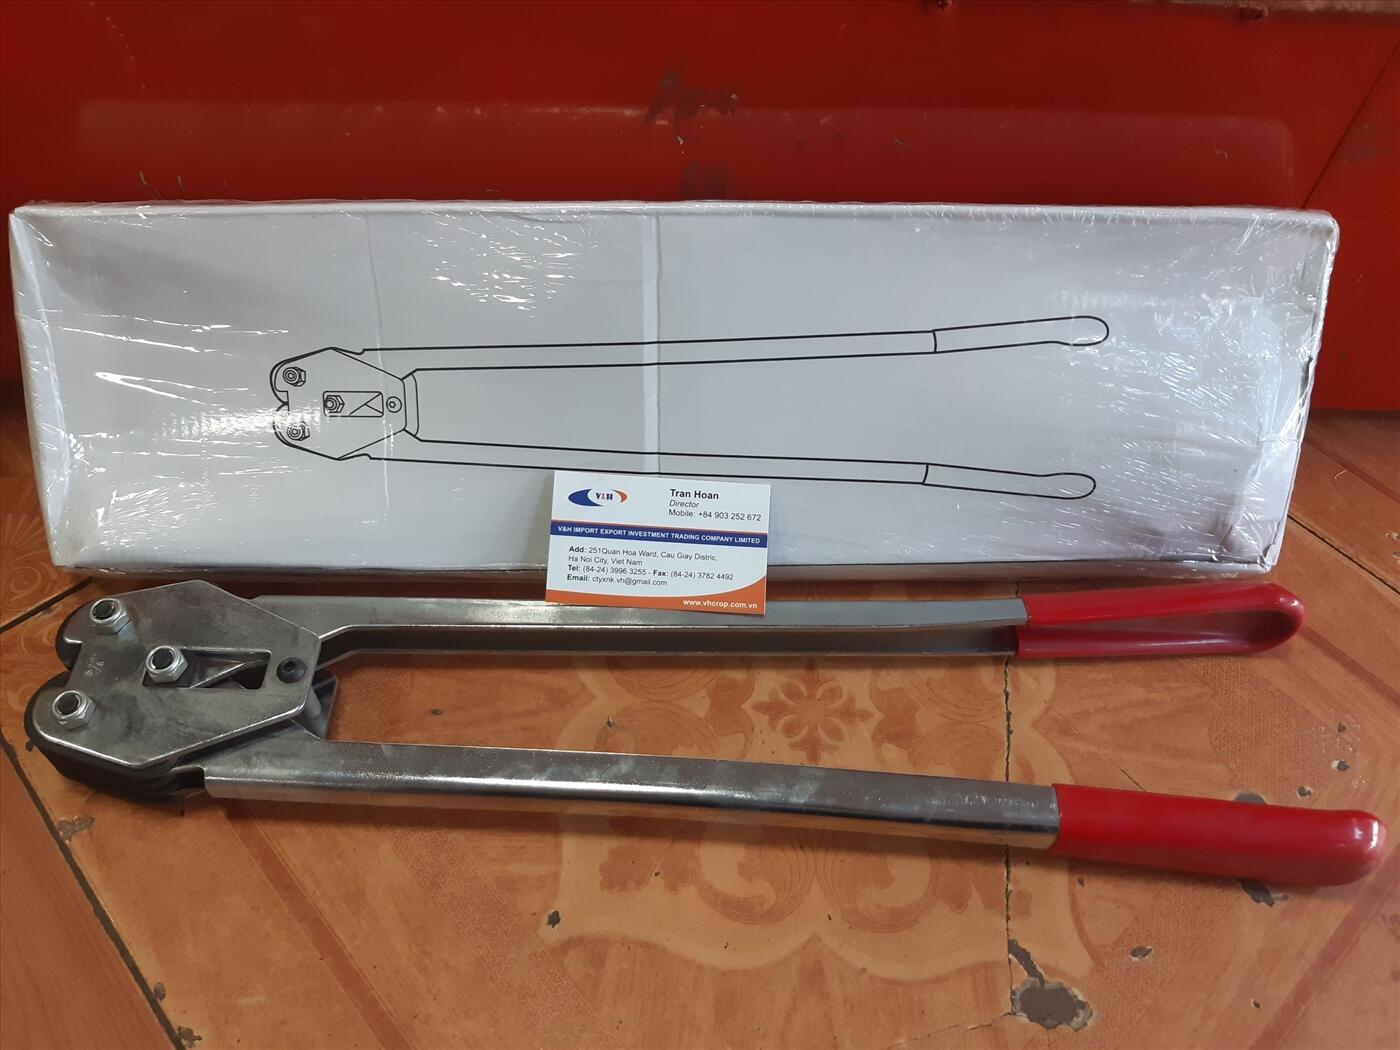 Dụng cụ kẹp đai nhựa C310